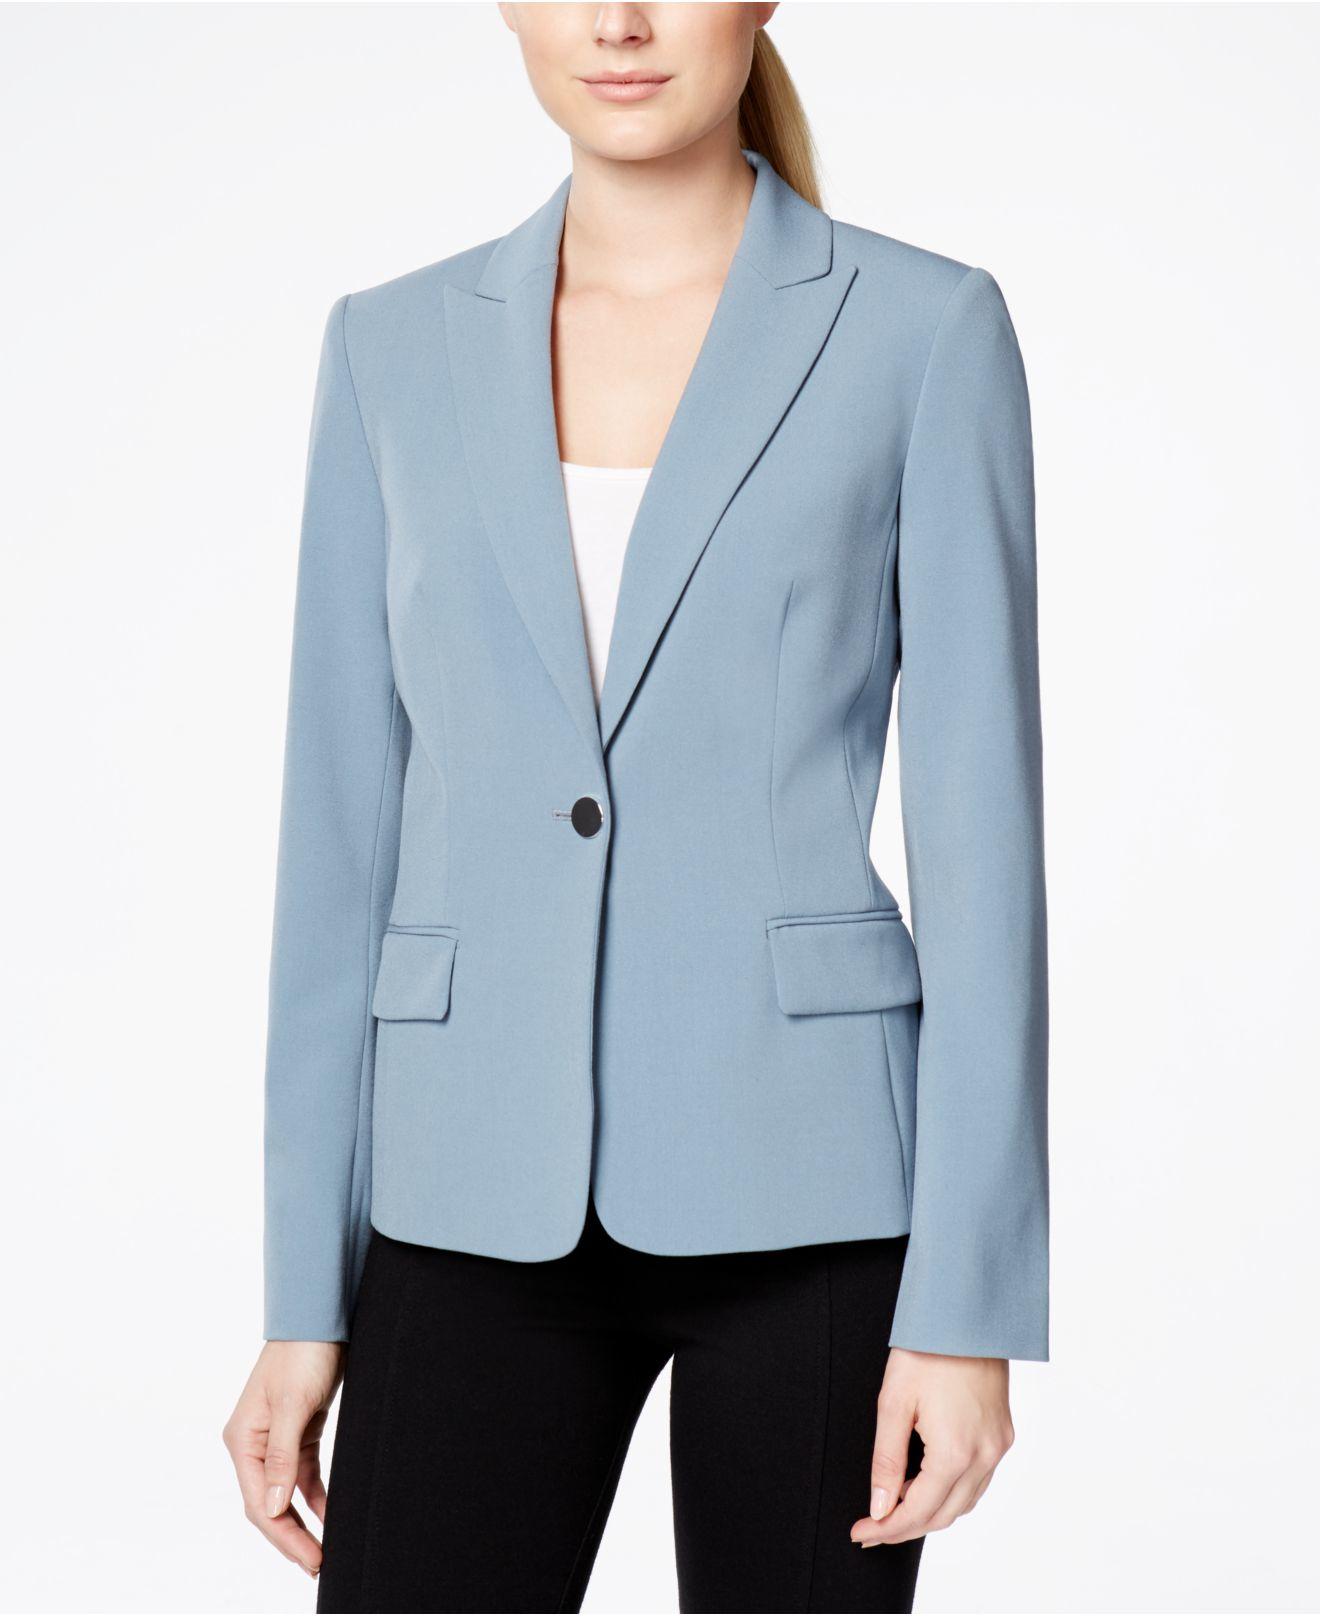 Calvin Klein Womens Suits Macys